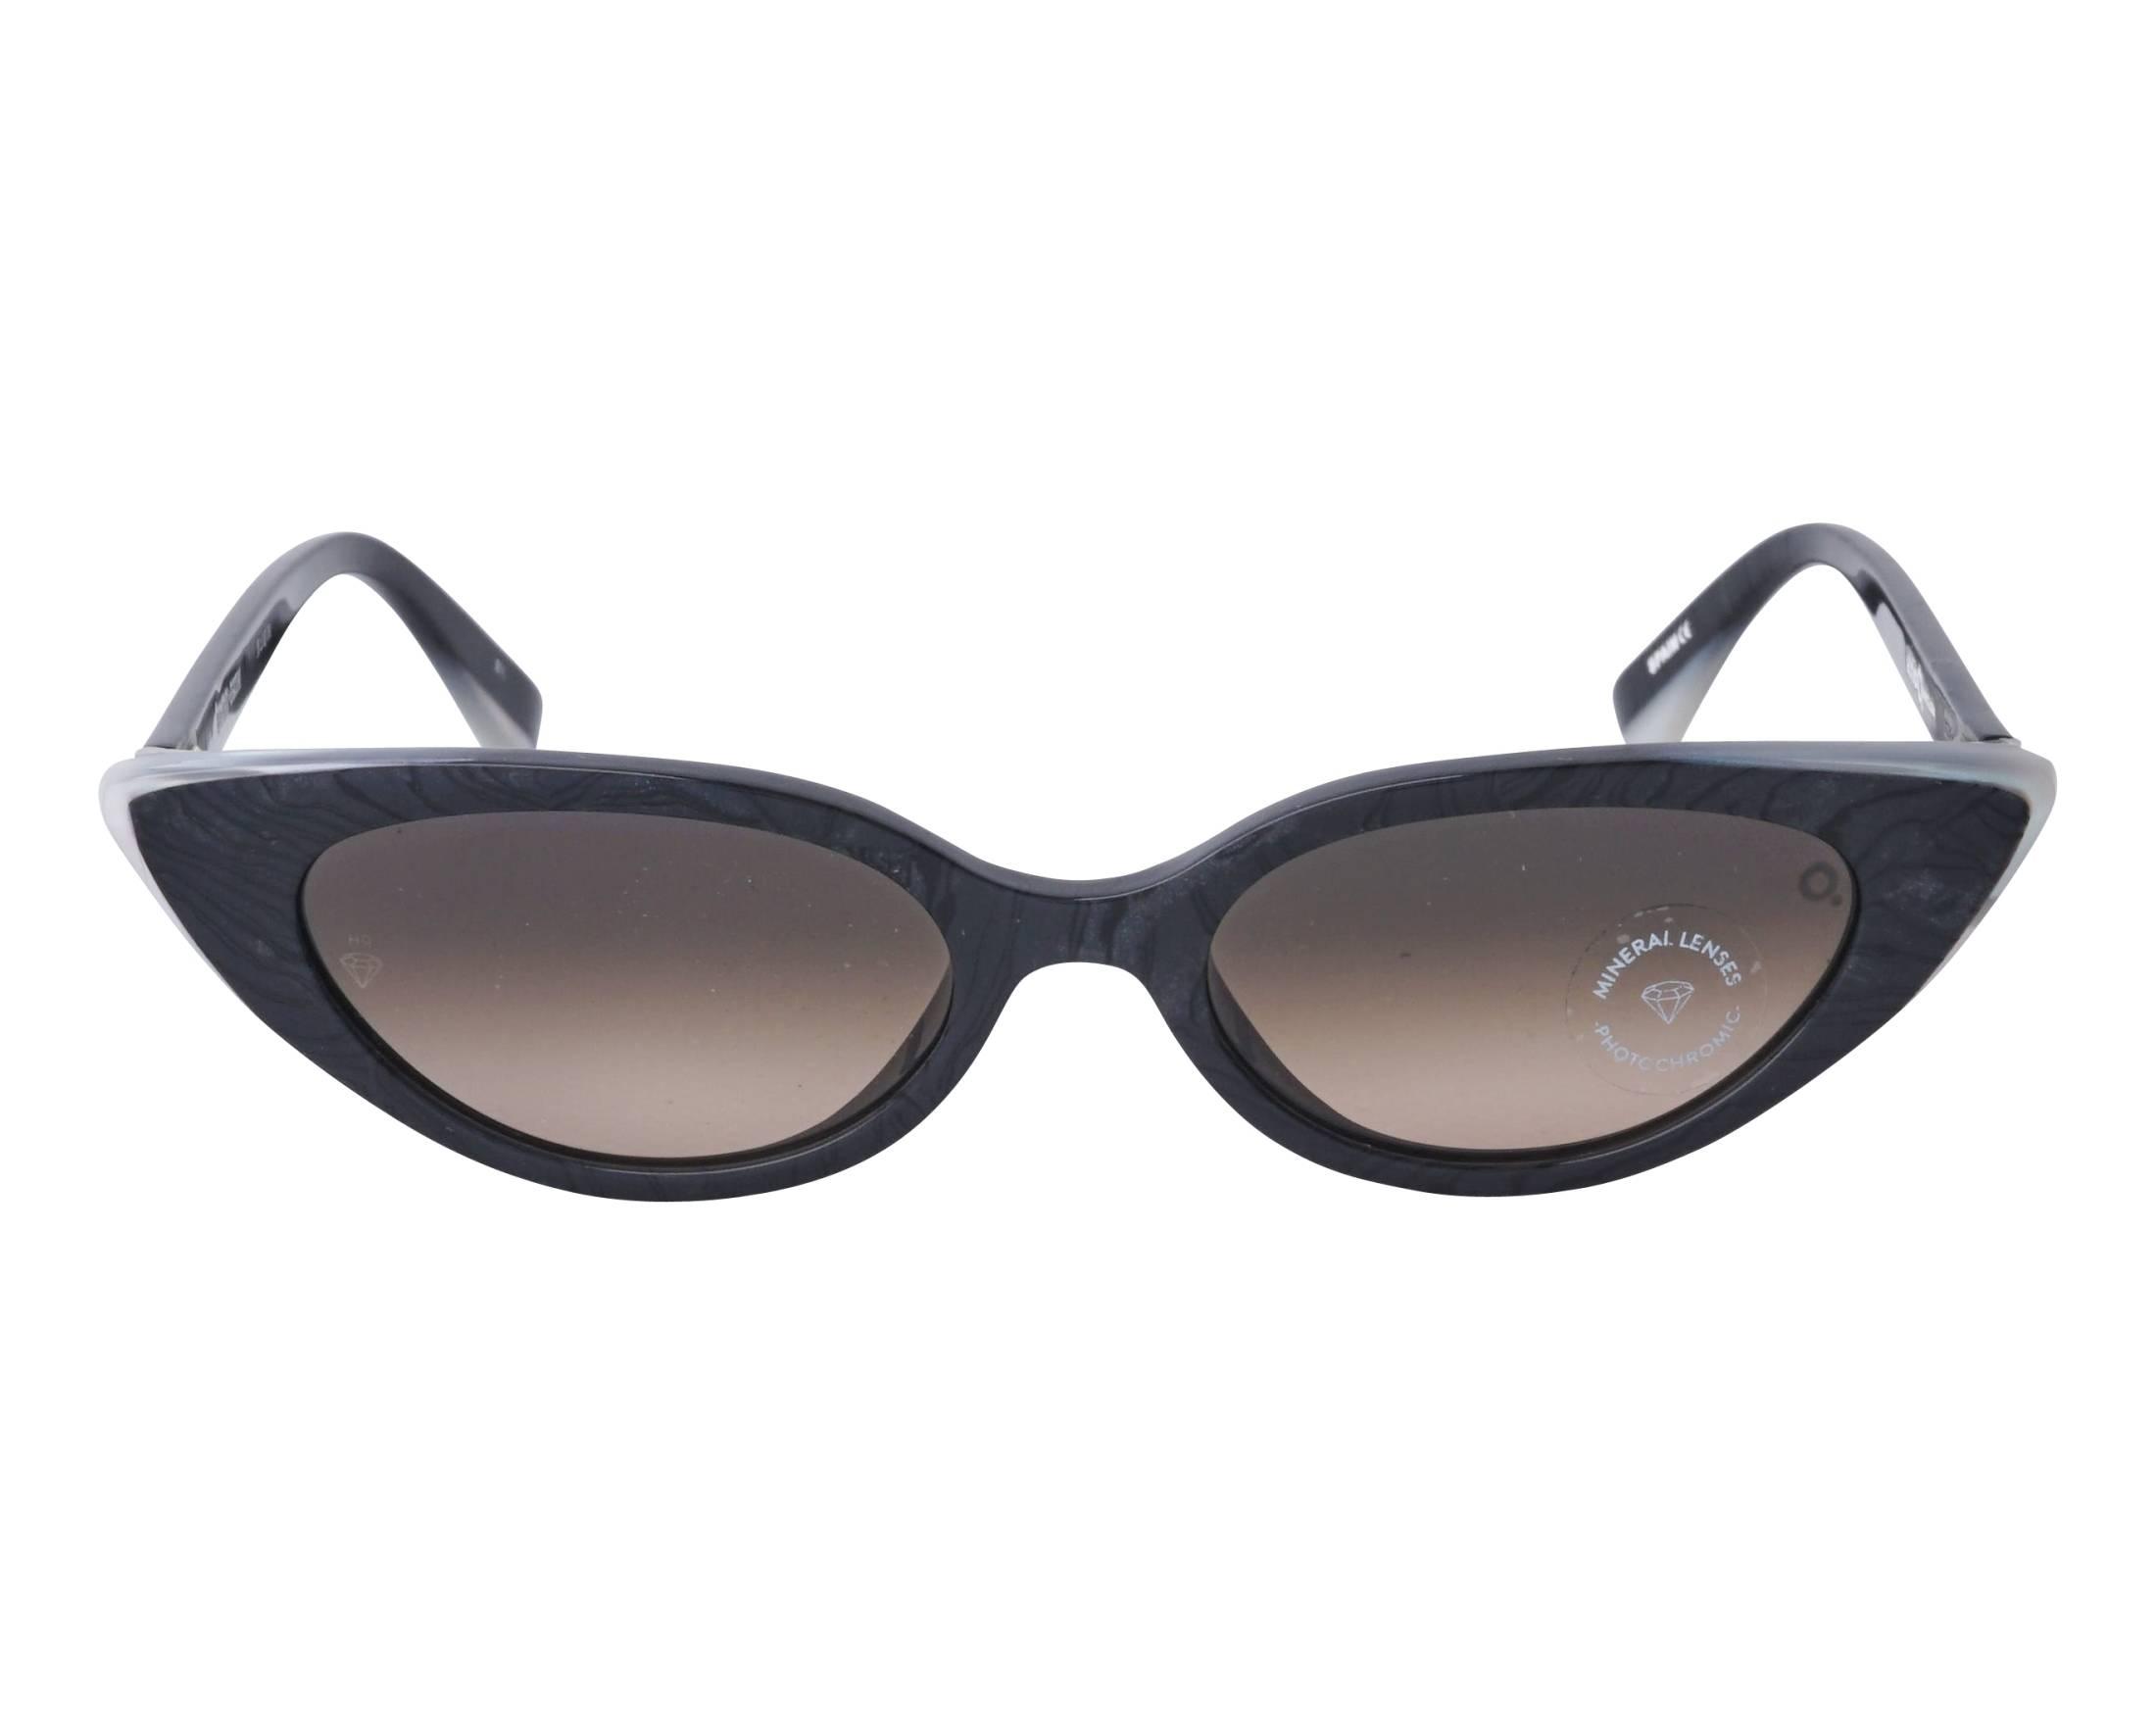 c09f1bab03 Sunglasses Etnia Barcelona BANDAI BKWH 51-18 Black Opal front view